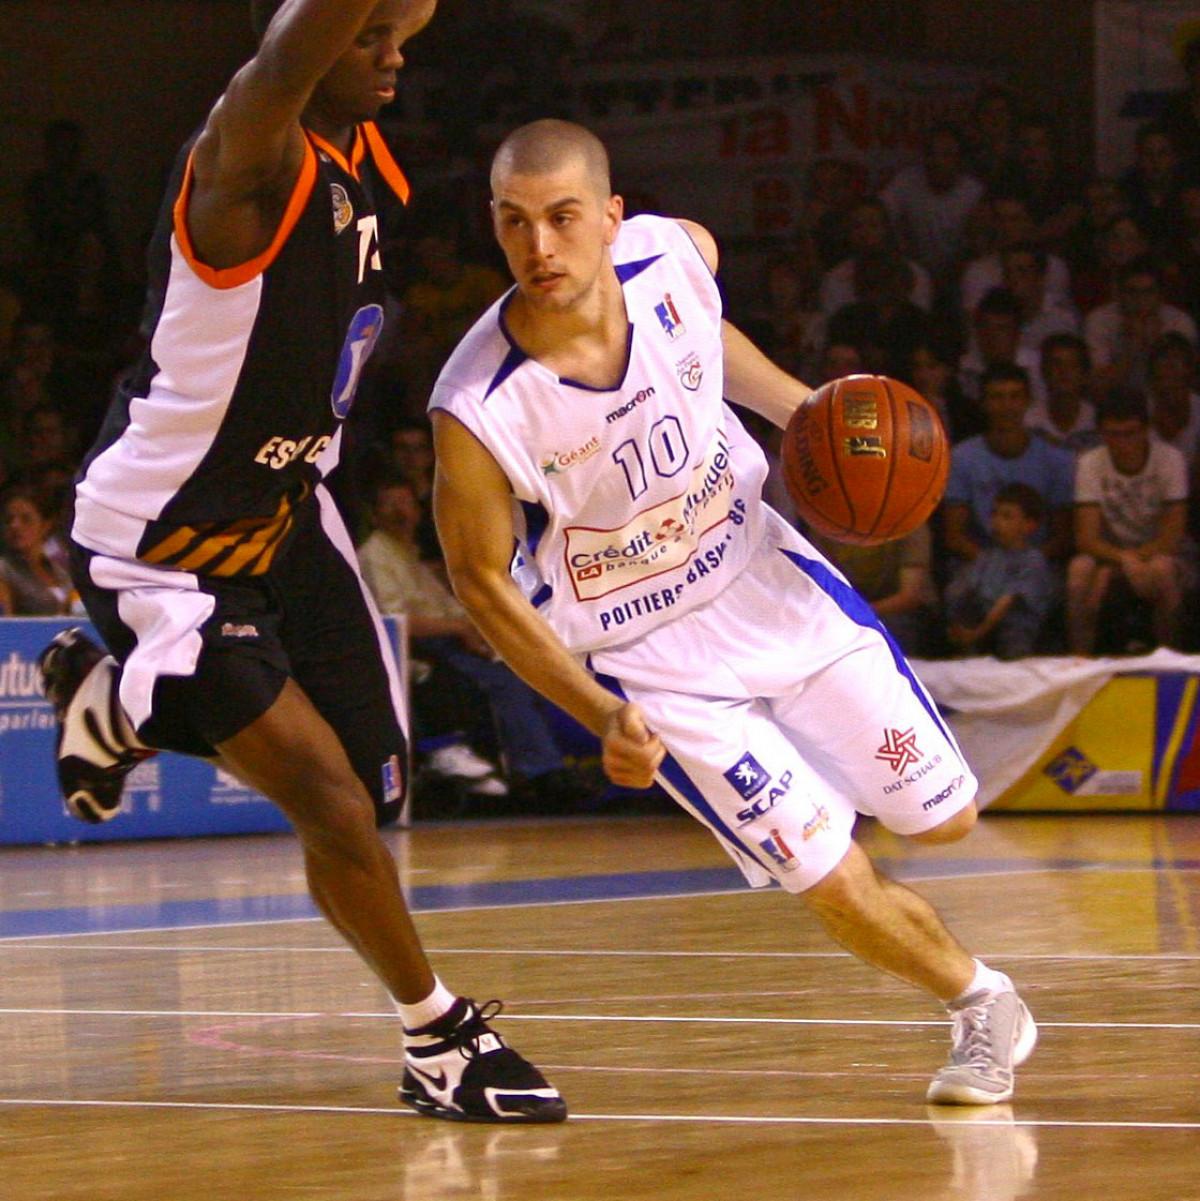 Photo of Guillaume Costentin, 2007-2008 season